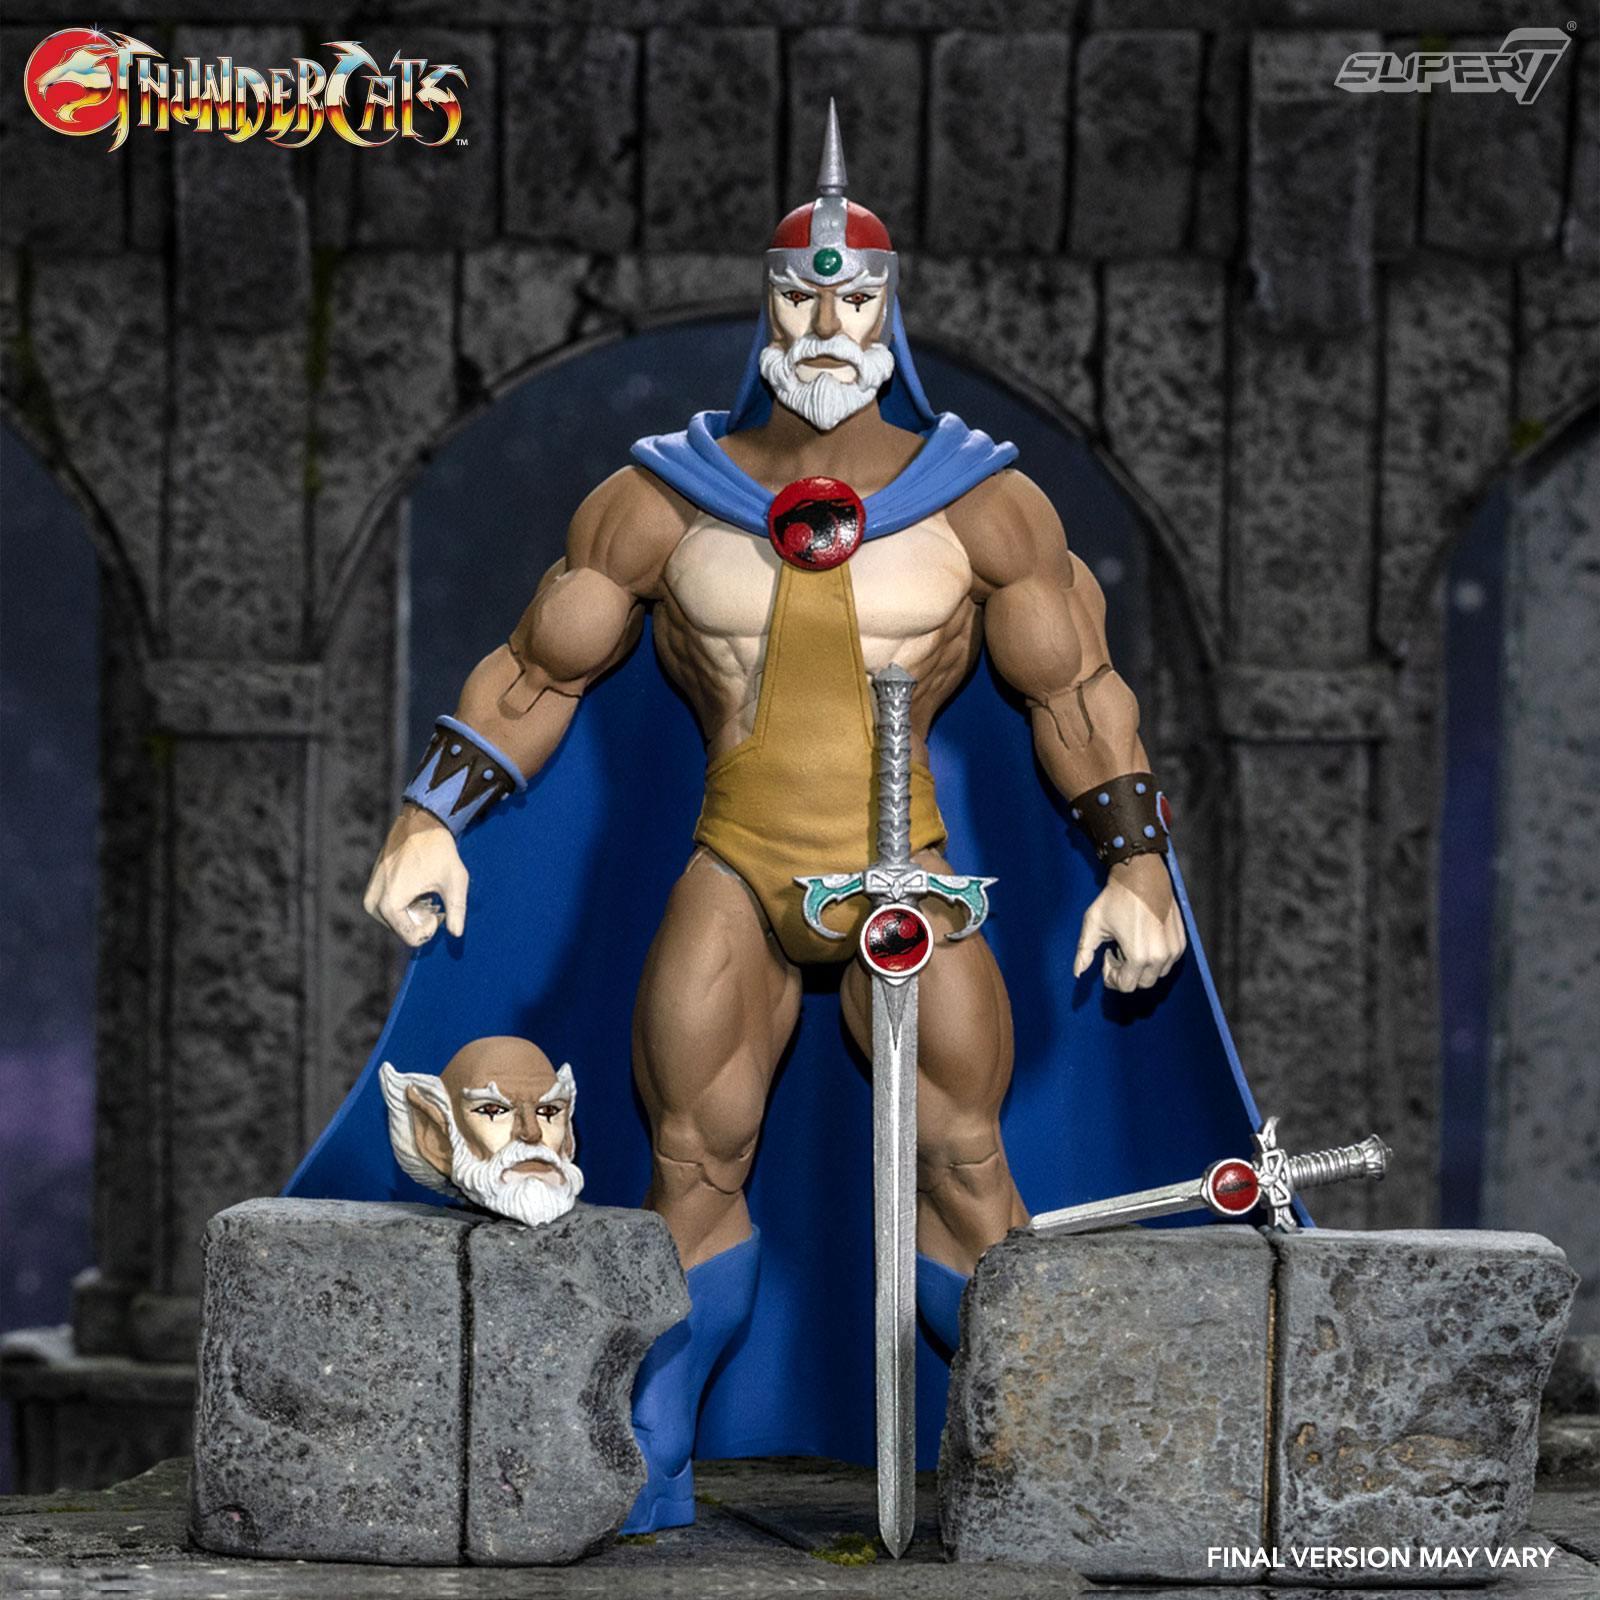 Thundercats wave 3 figurine ultimates jaga the wise thundercat mentor 18 cm super7 suukoo toys